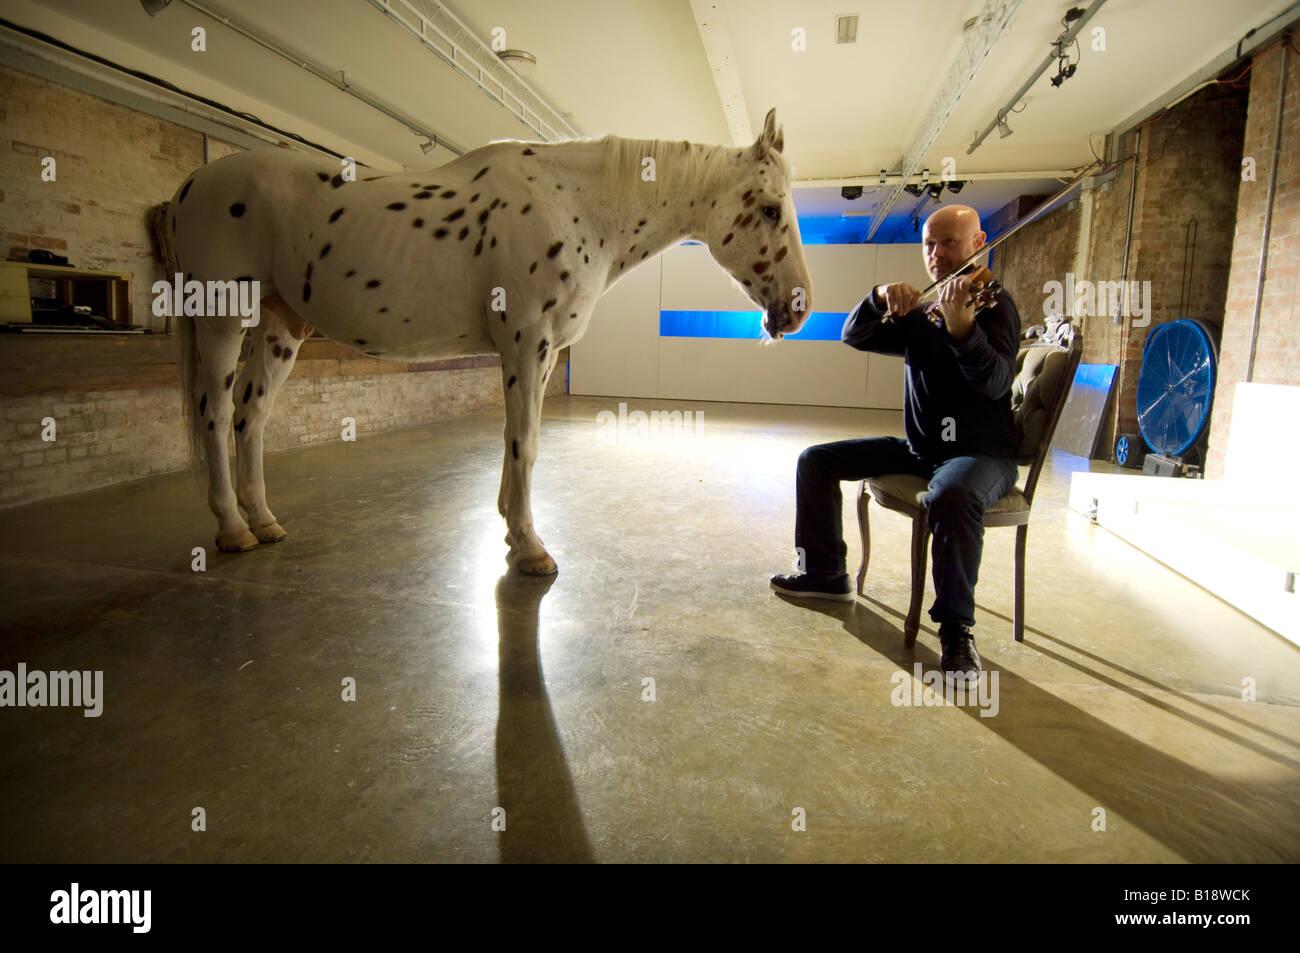 Man serenades horse with violin in theatre as part of Brighton Festival - Stock Image